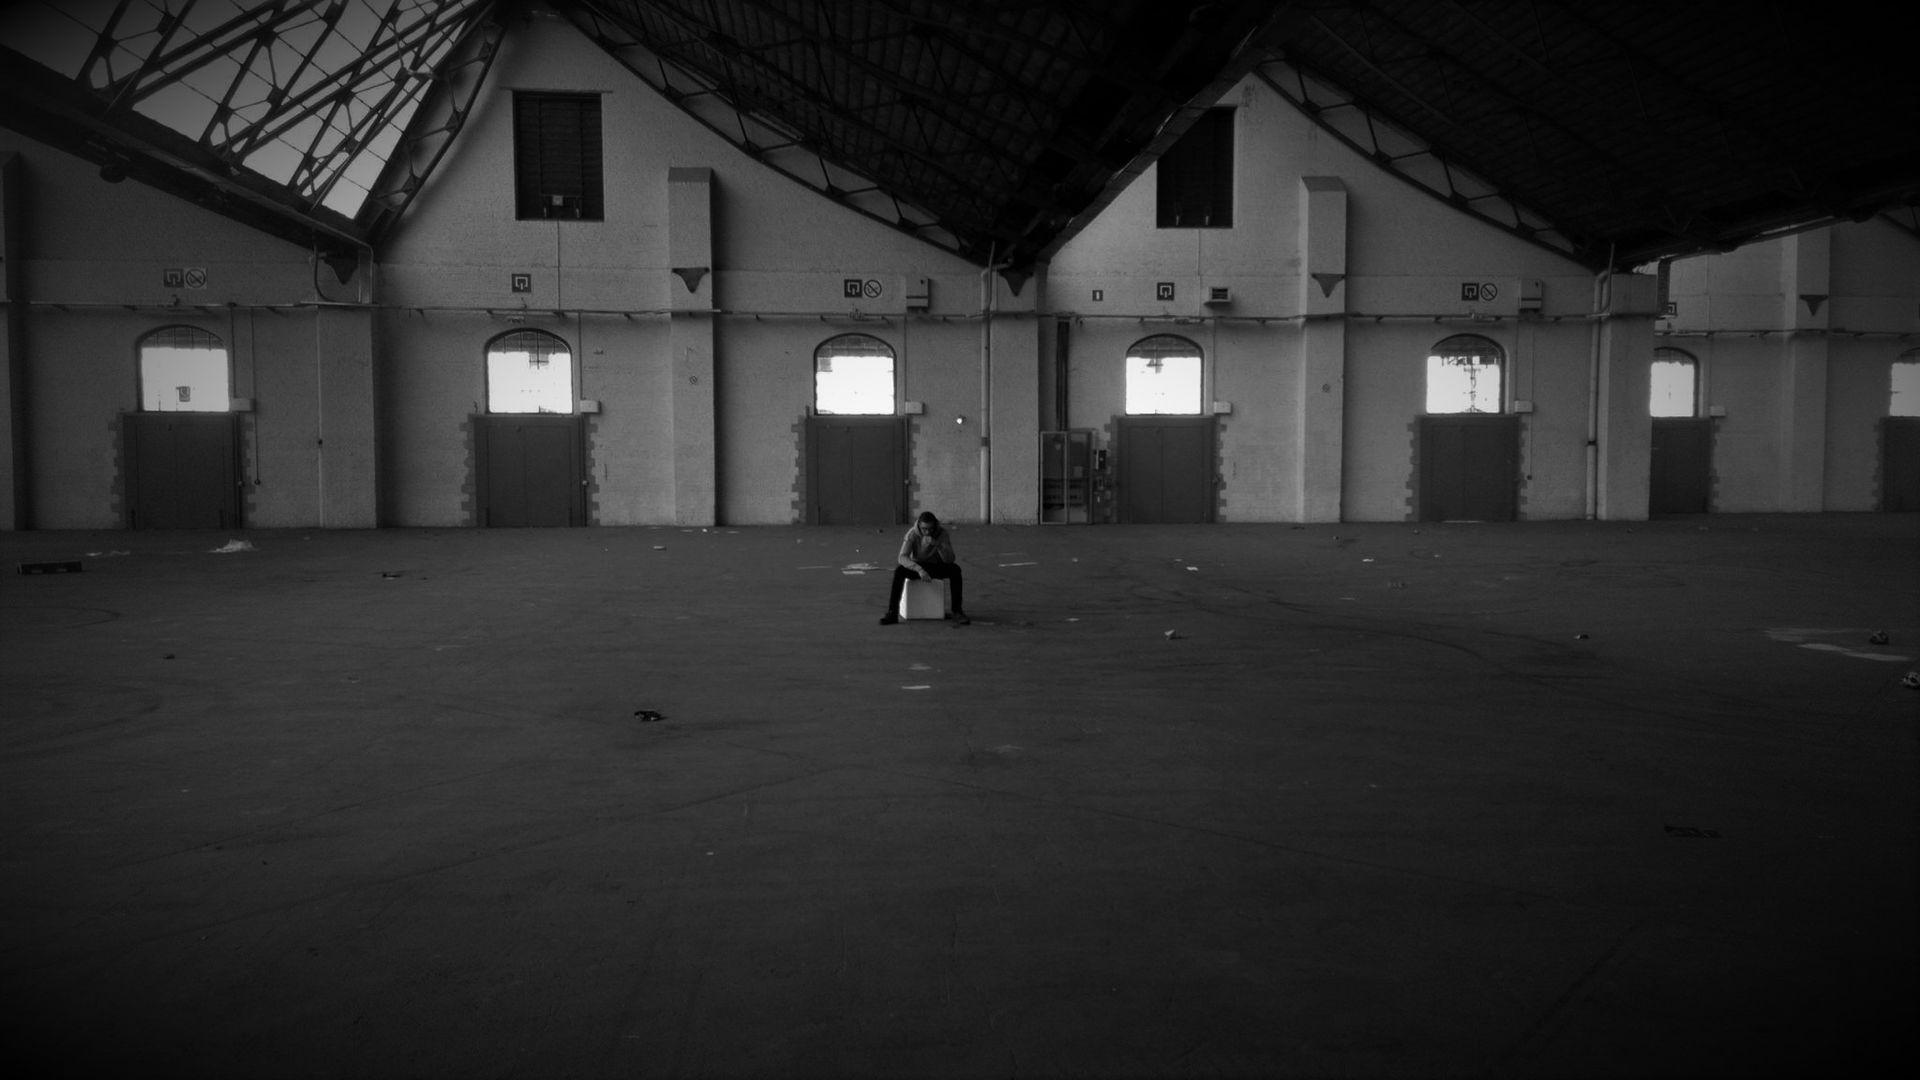 C02 (music video) BTS - Luciano D'Amato